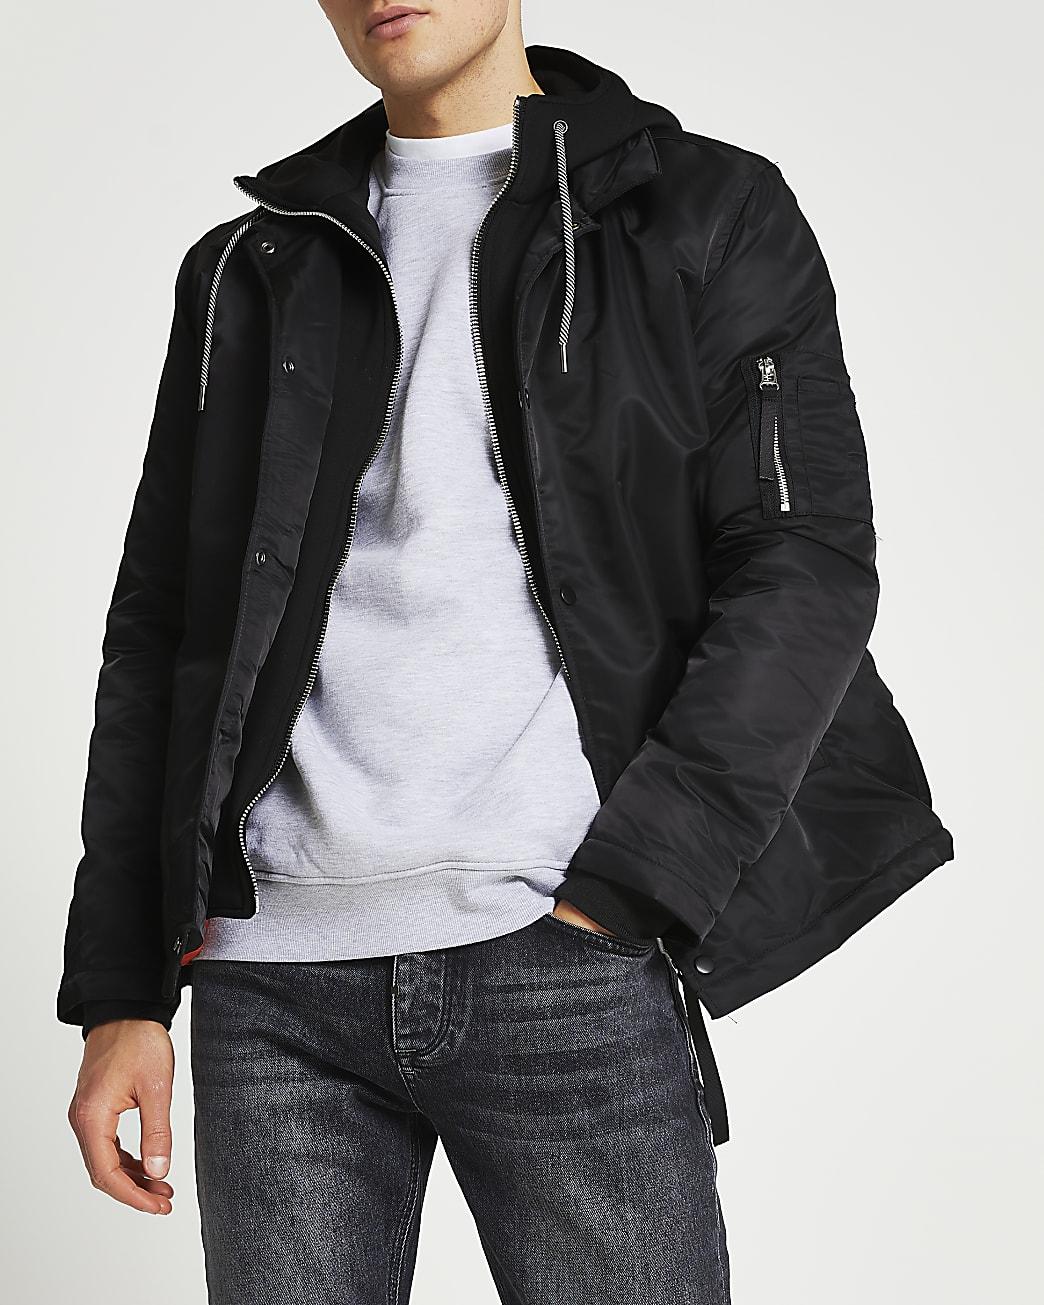 Black hooded coach jacket